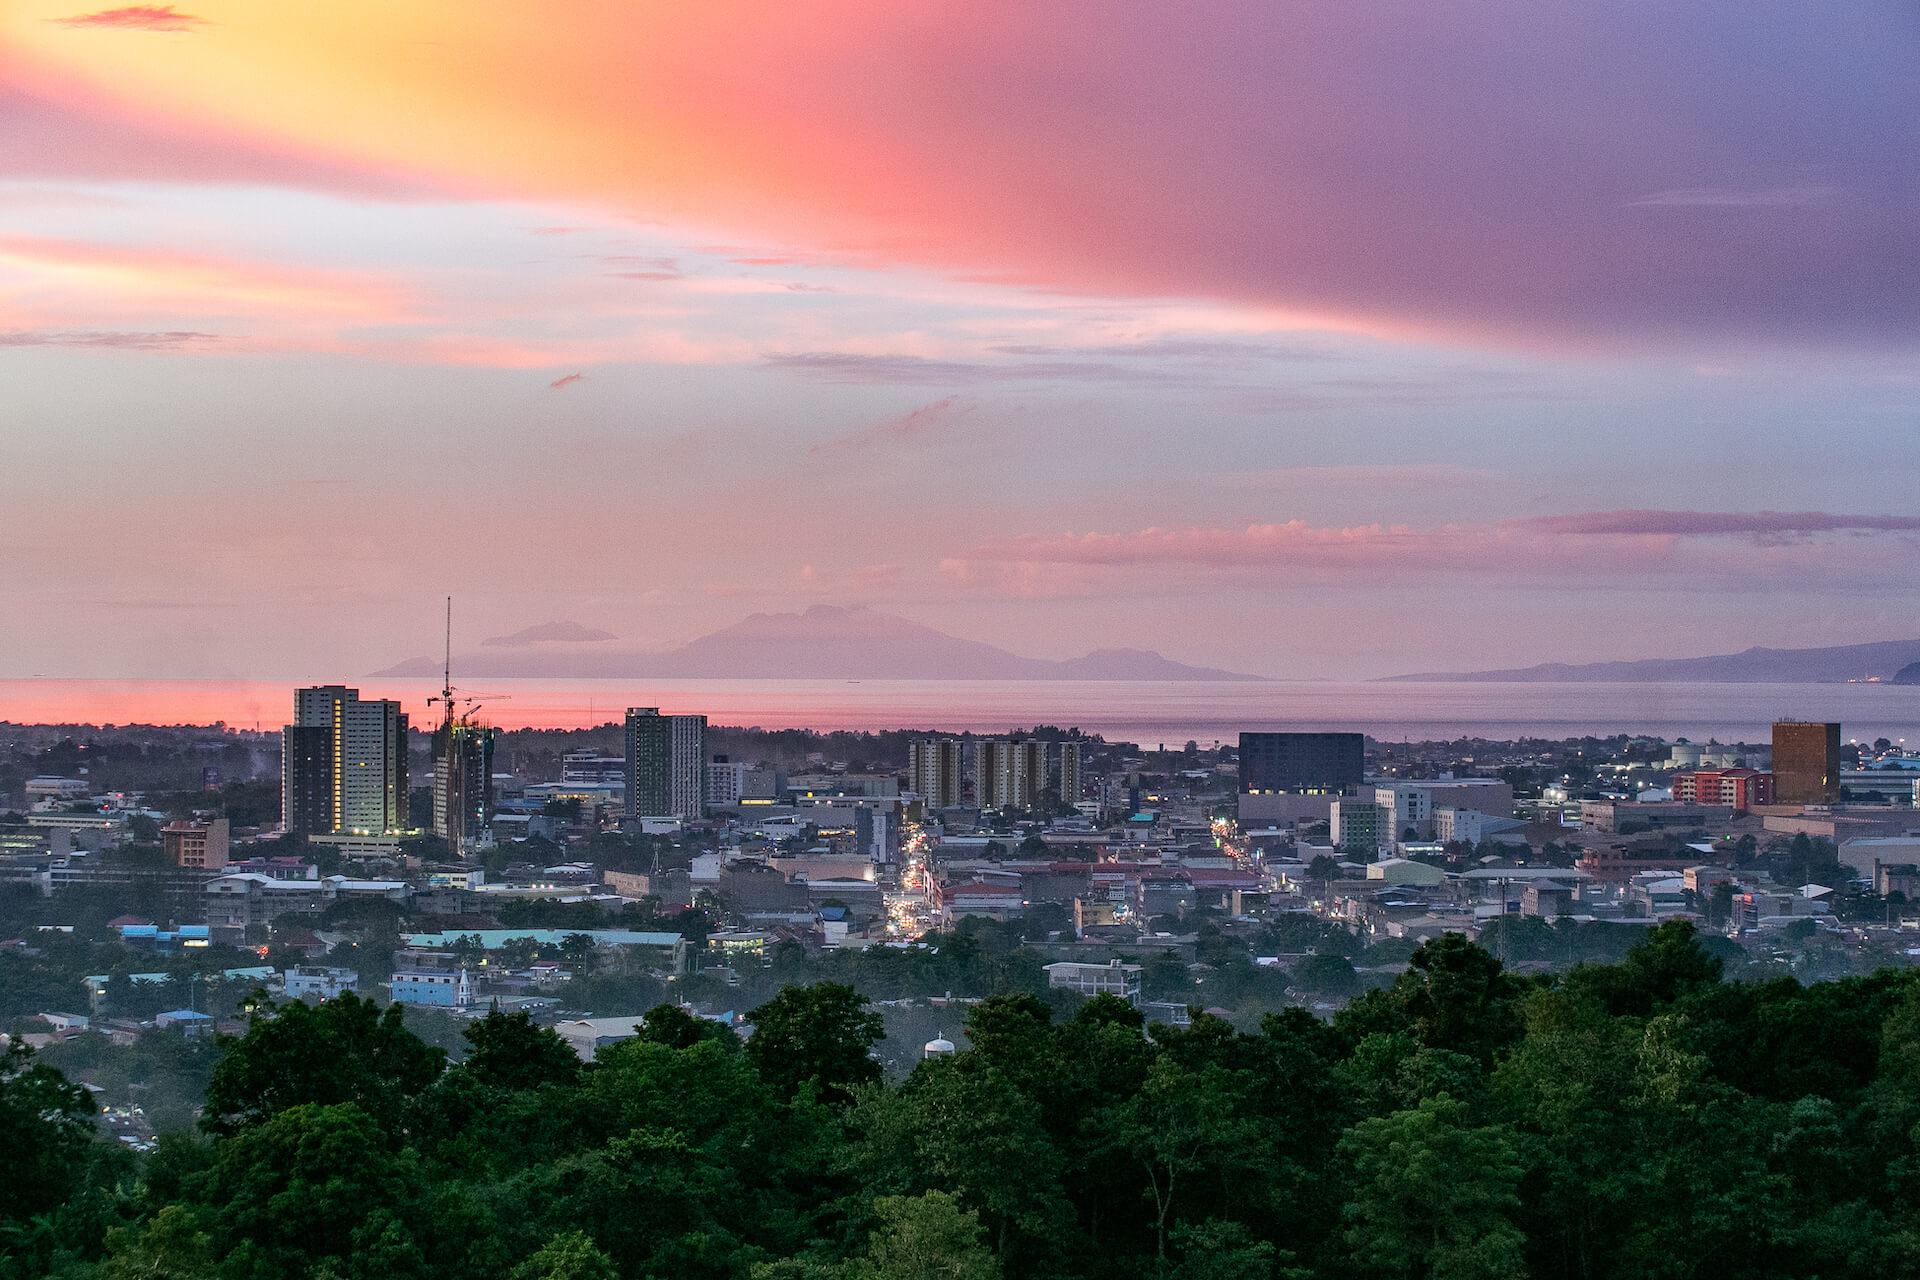 Sunset view of Cagayan de Oro city. Photo by Earl Ryan Janubas